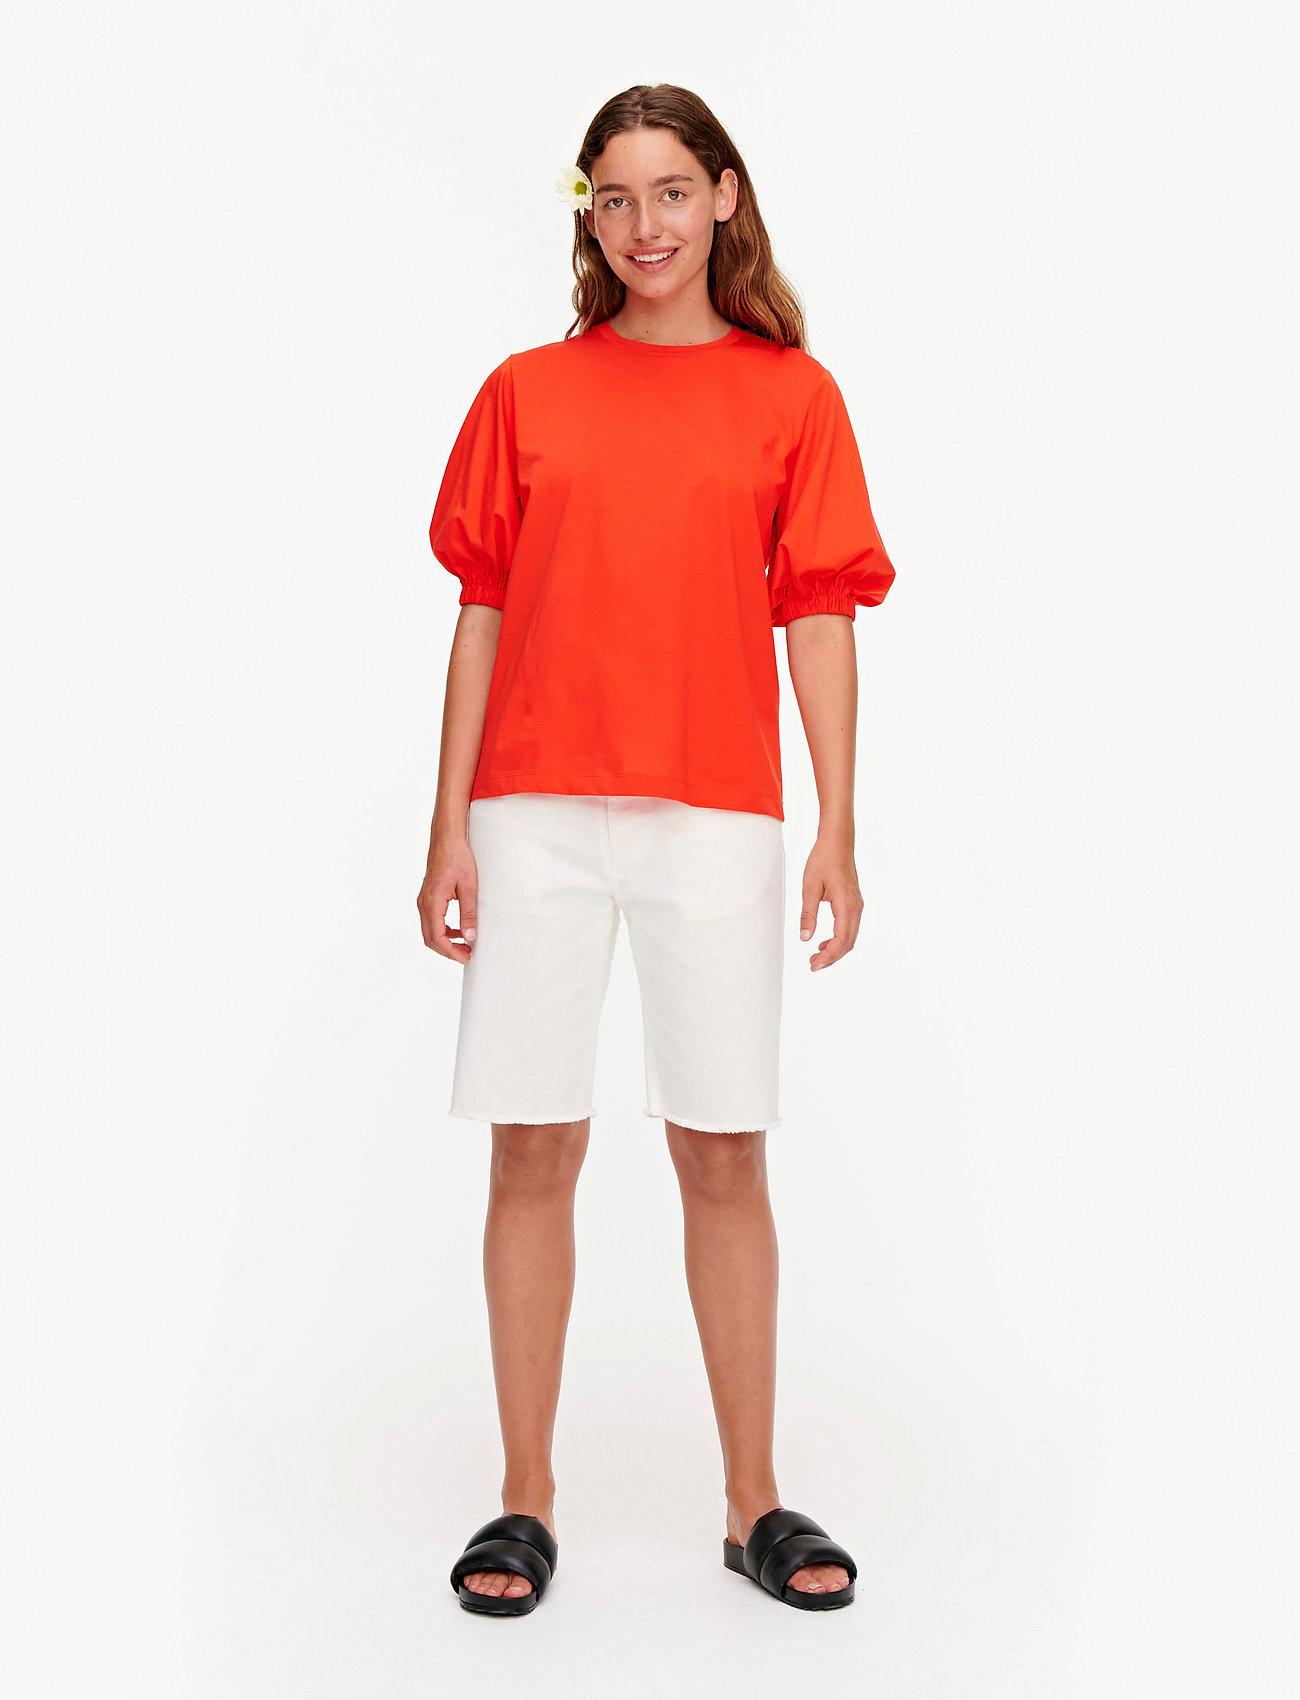 Marimekko - TUNSIT SOLID SHIRT - t-shirts - red - 0